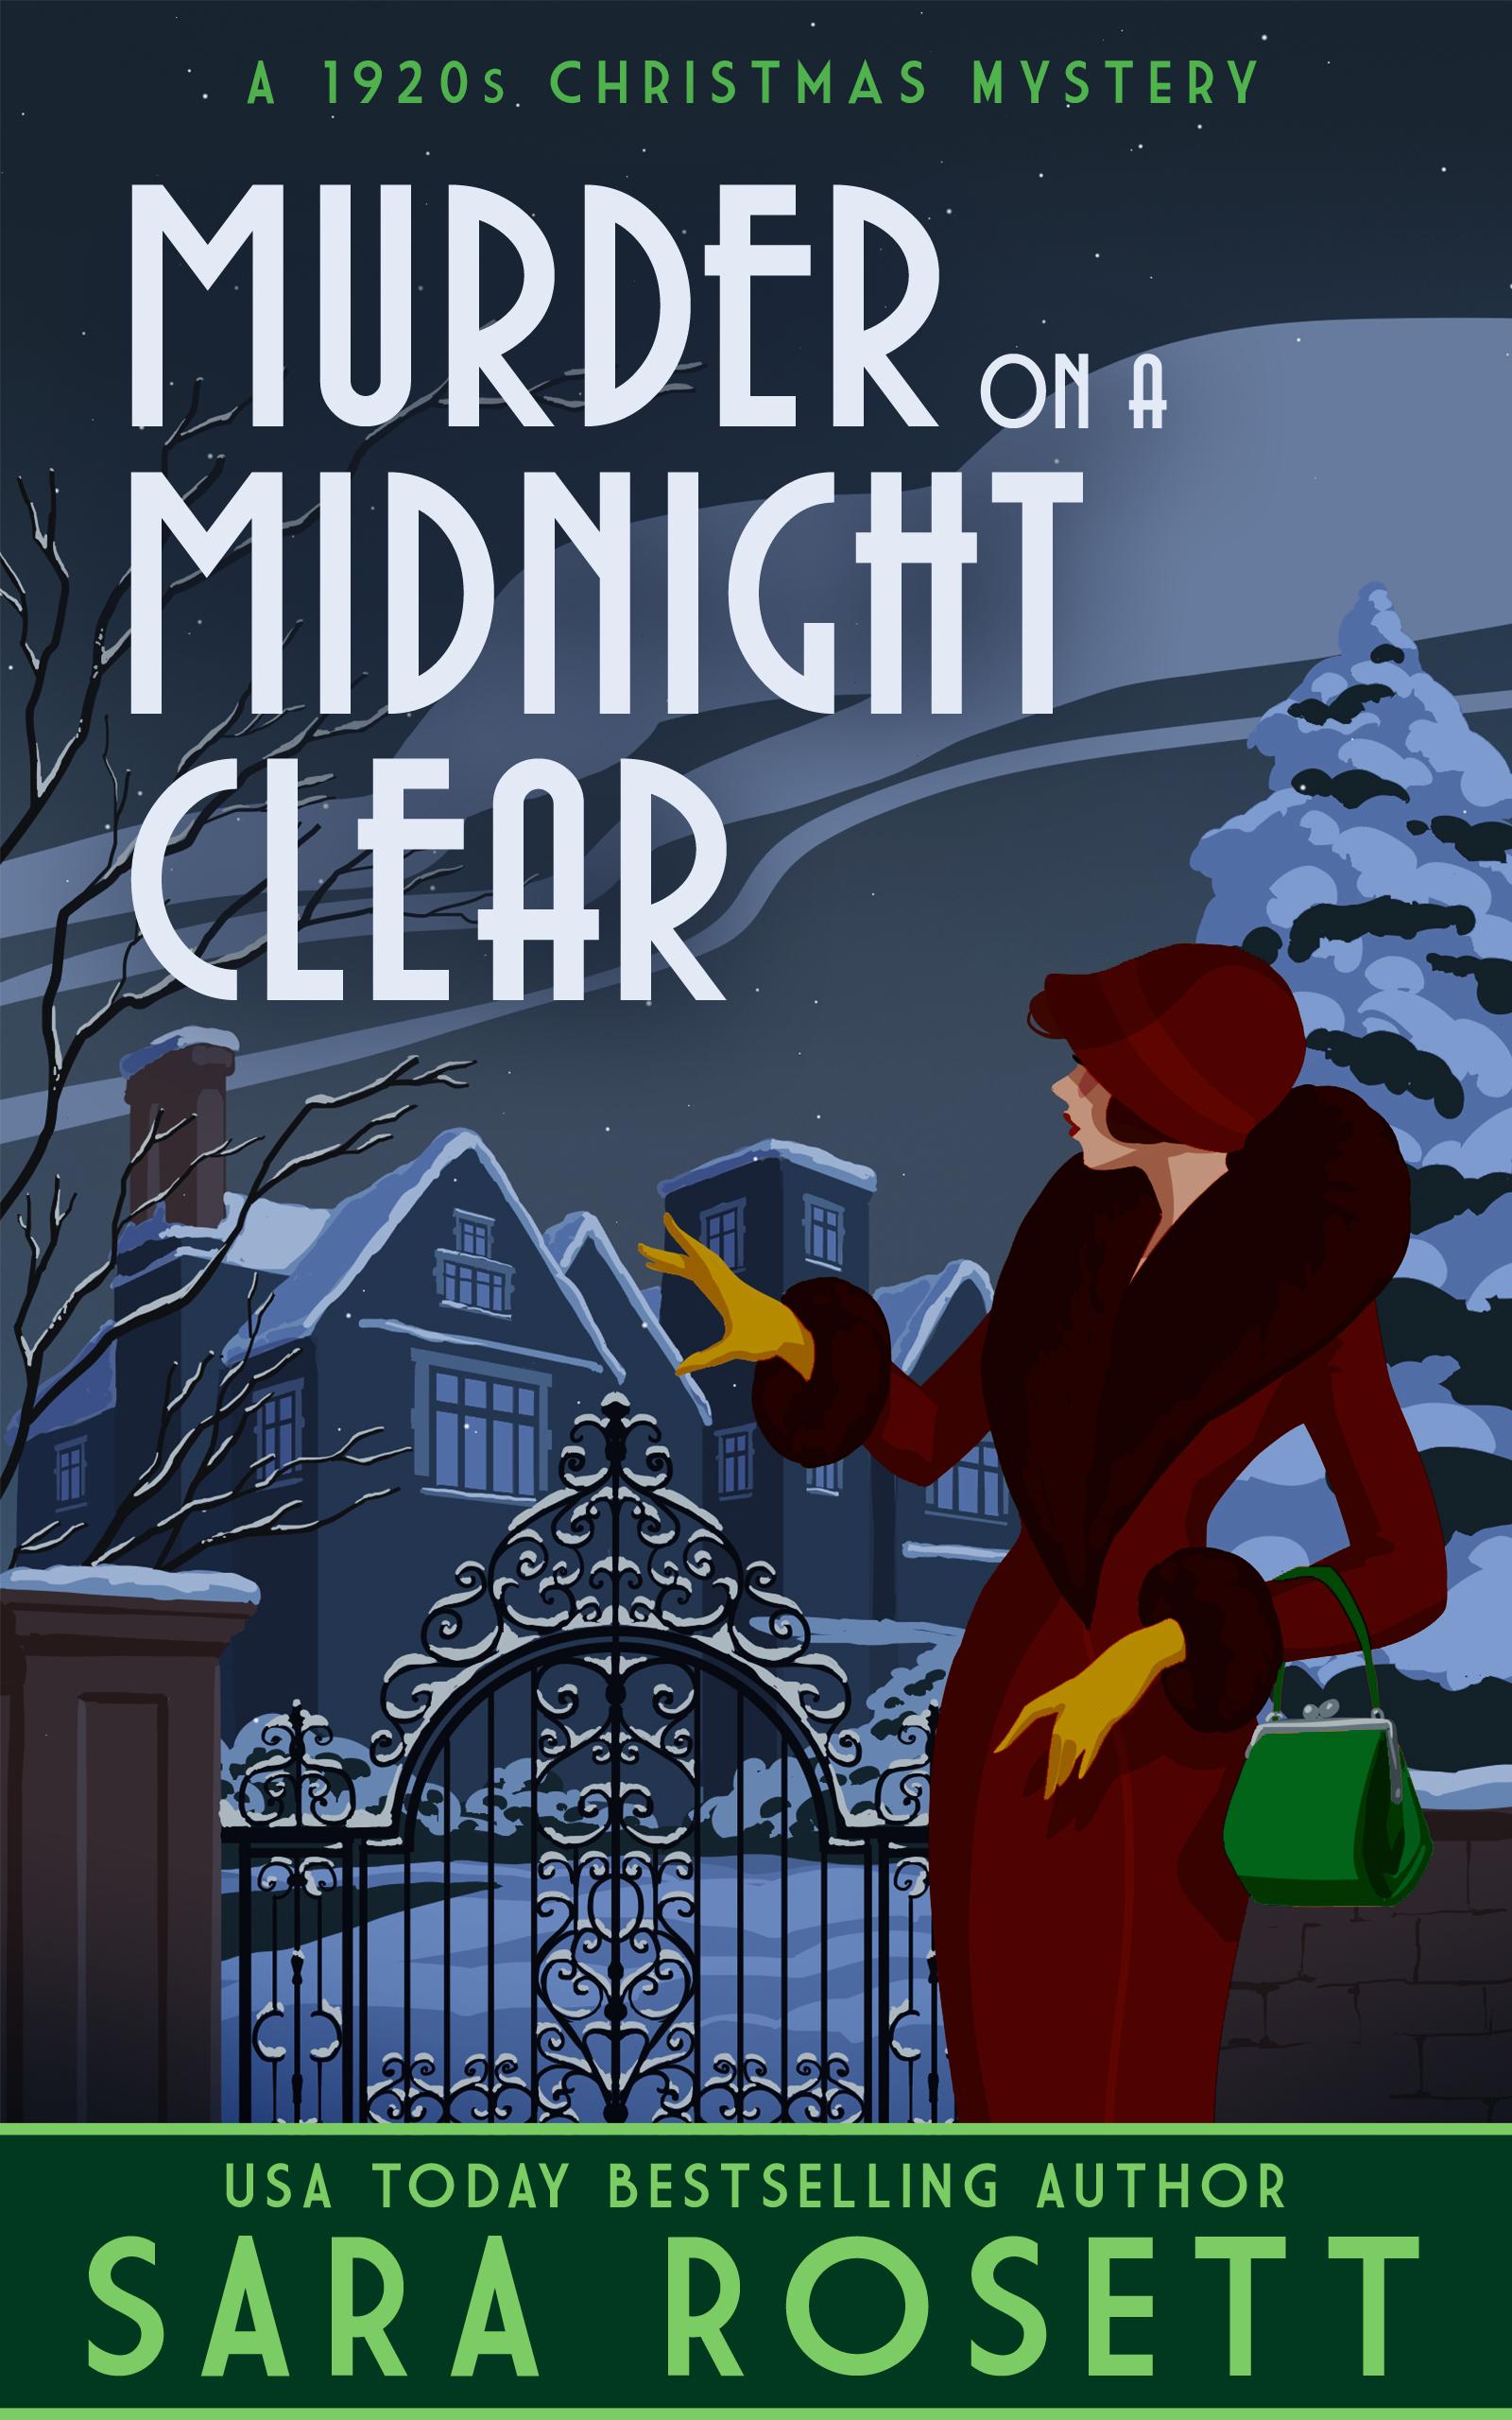 Murder on a Midnight Clear Sara Rosett Book Cover